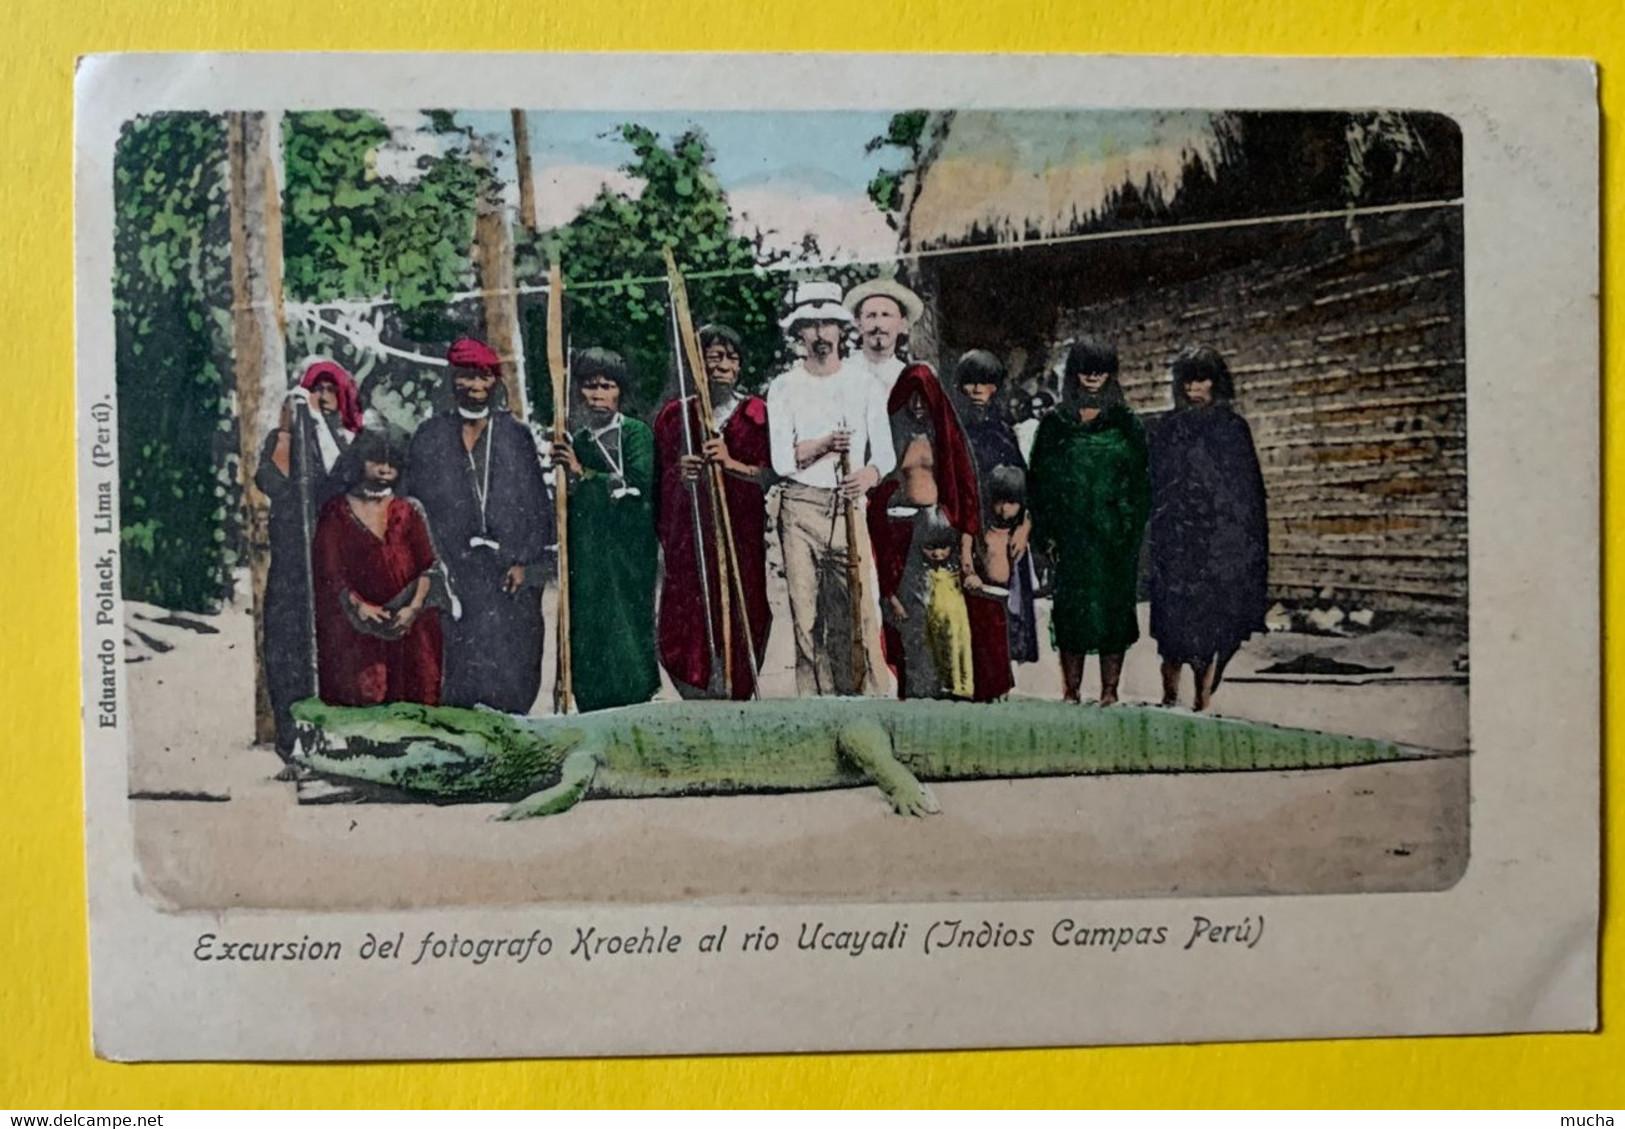 15605 -  Excursion Del Fotografo Kroehle Al Rio Ucayali Indios Campas Peru Retour De La Chasse Au Crocodile - Peru